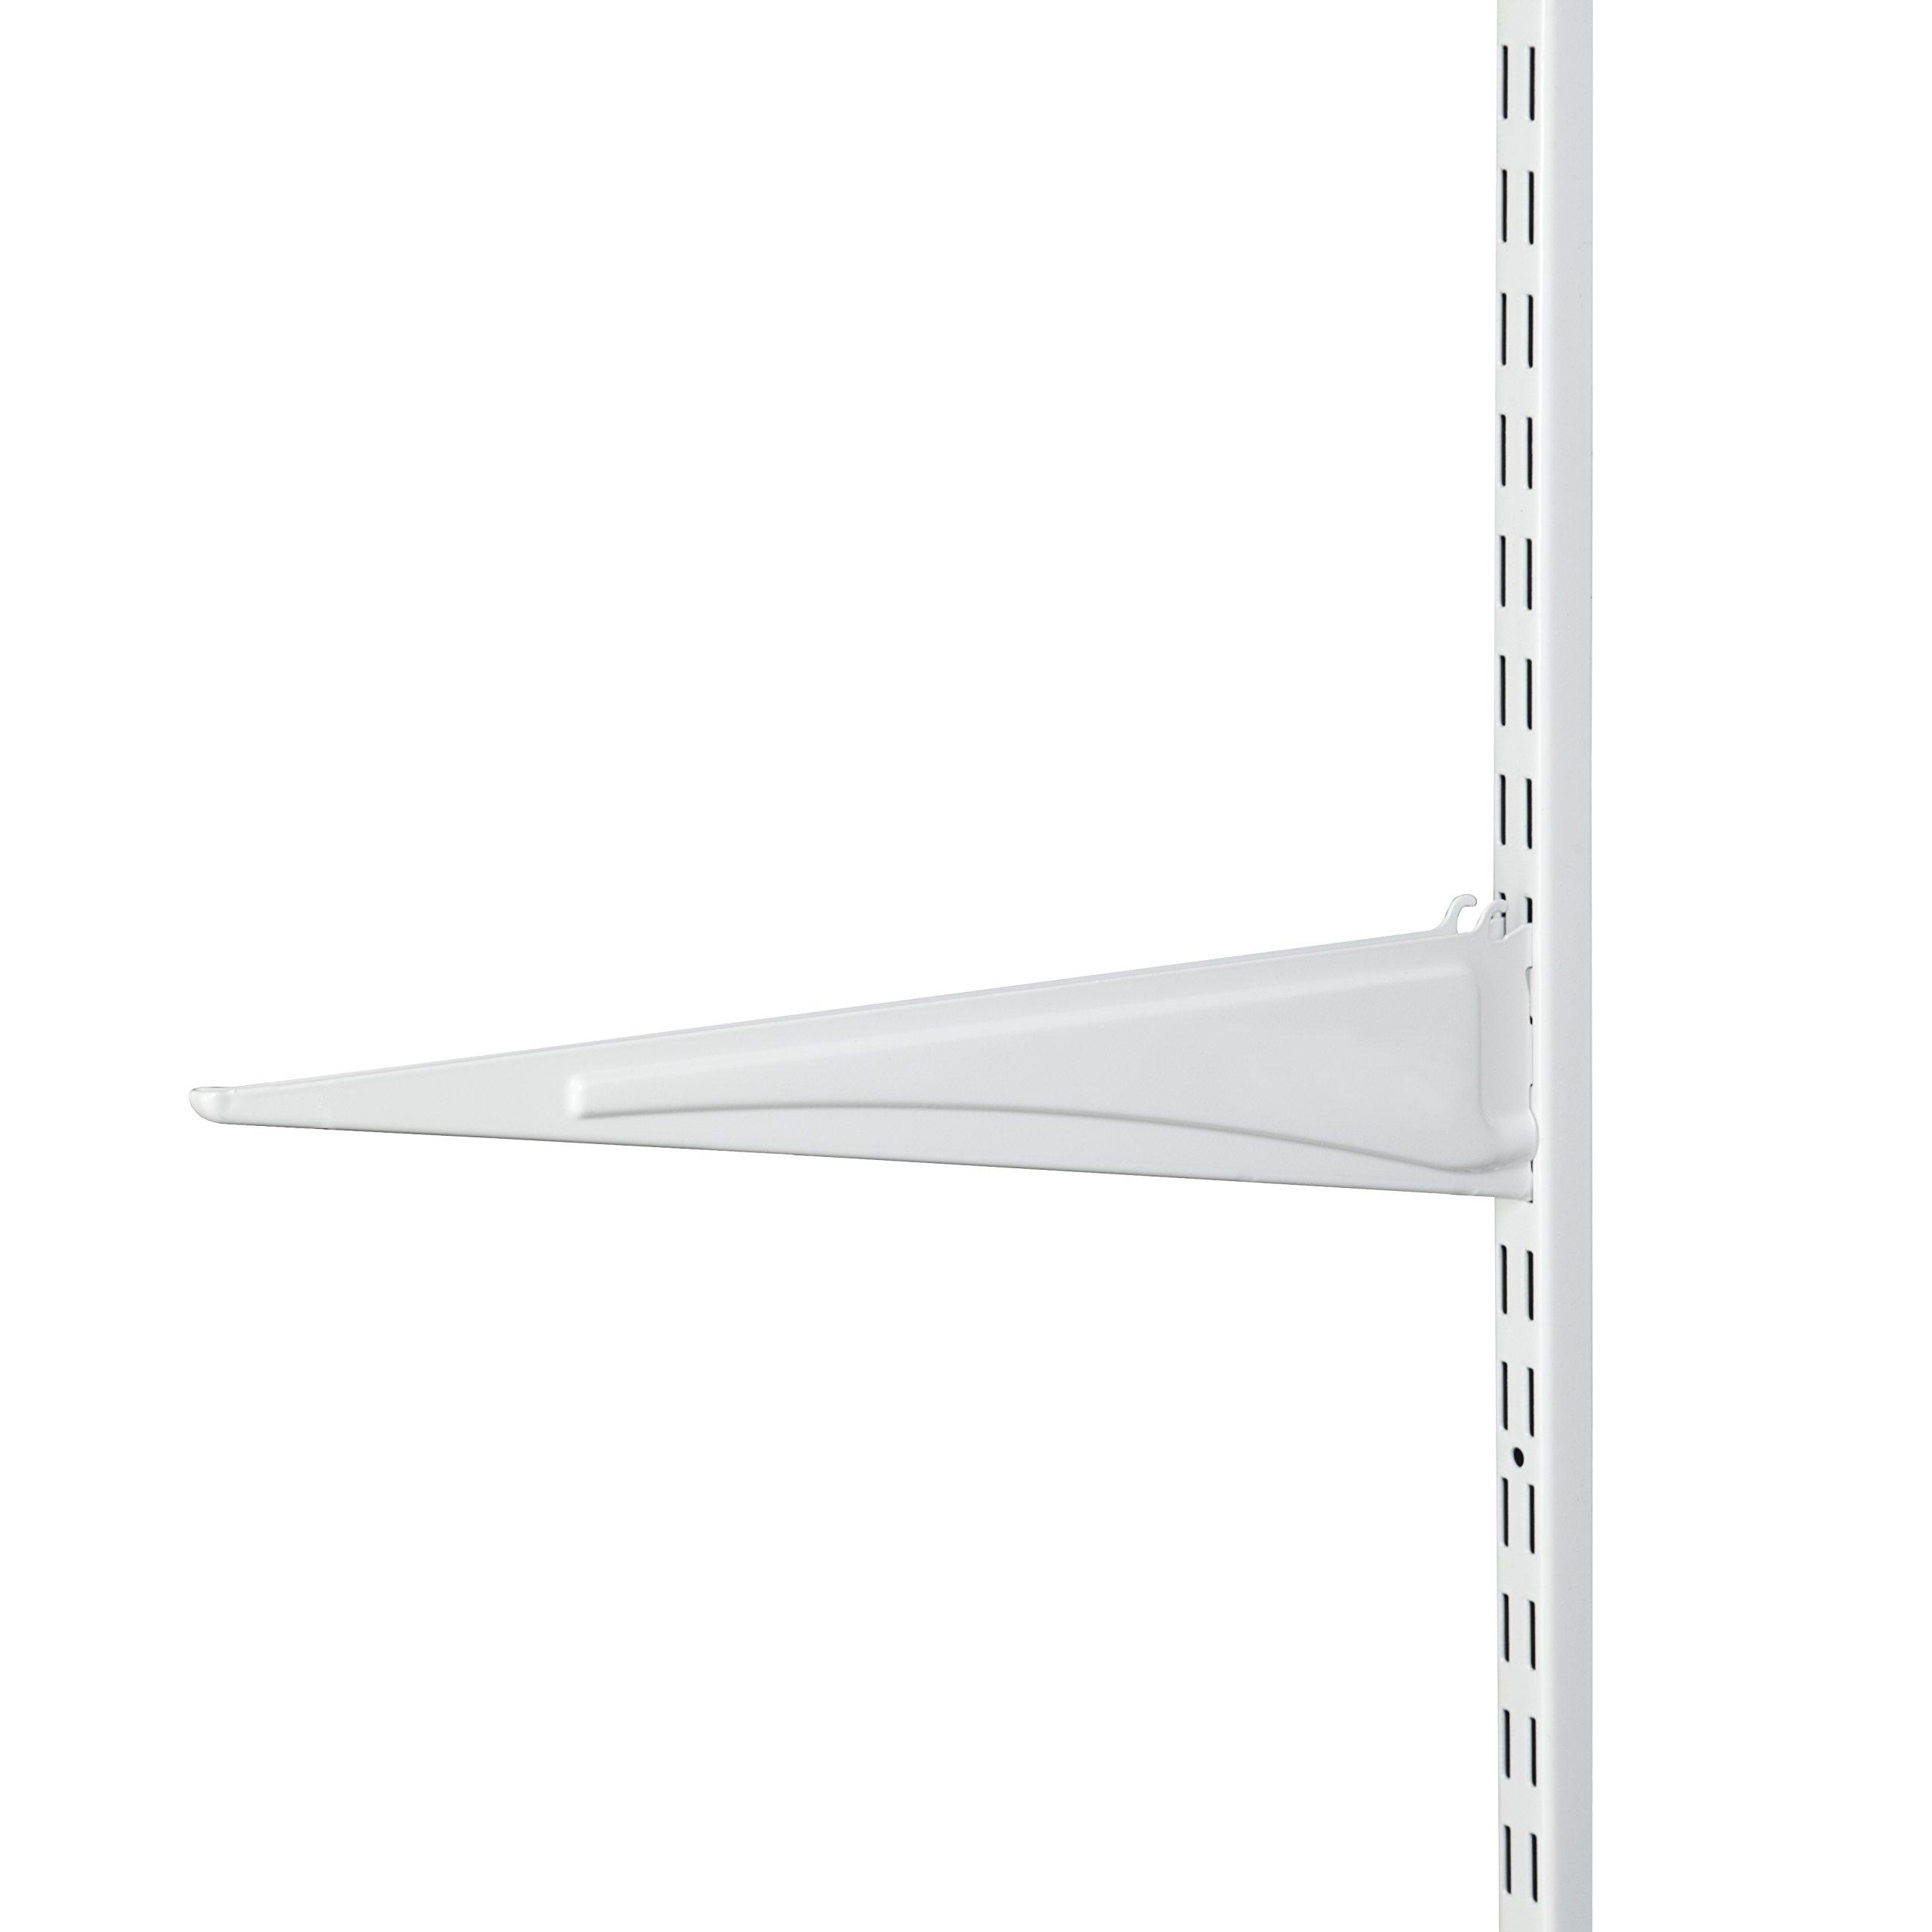 ClosetMaid 2854 ShelfTrack 16-Inch Locking Shelf Bracket, White